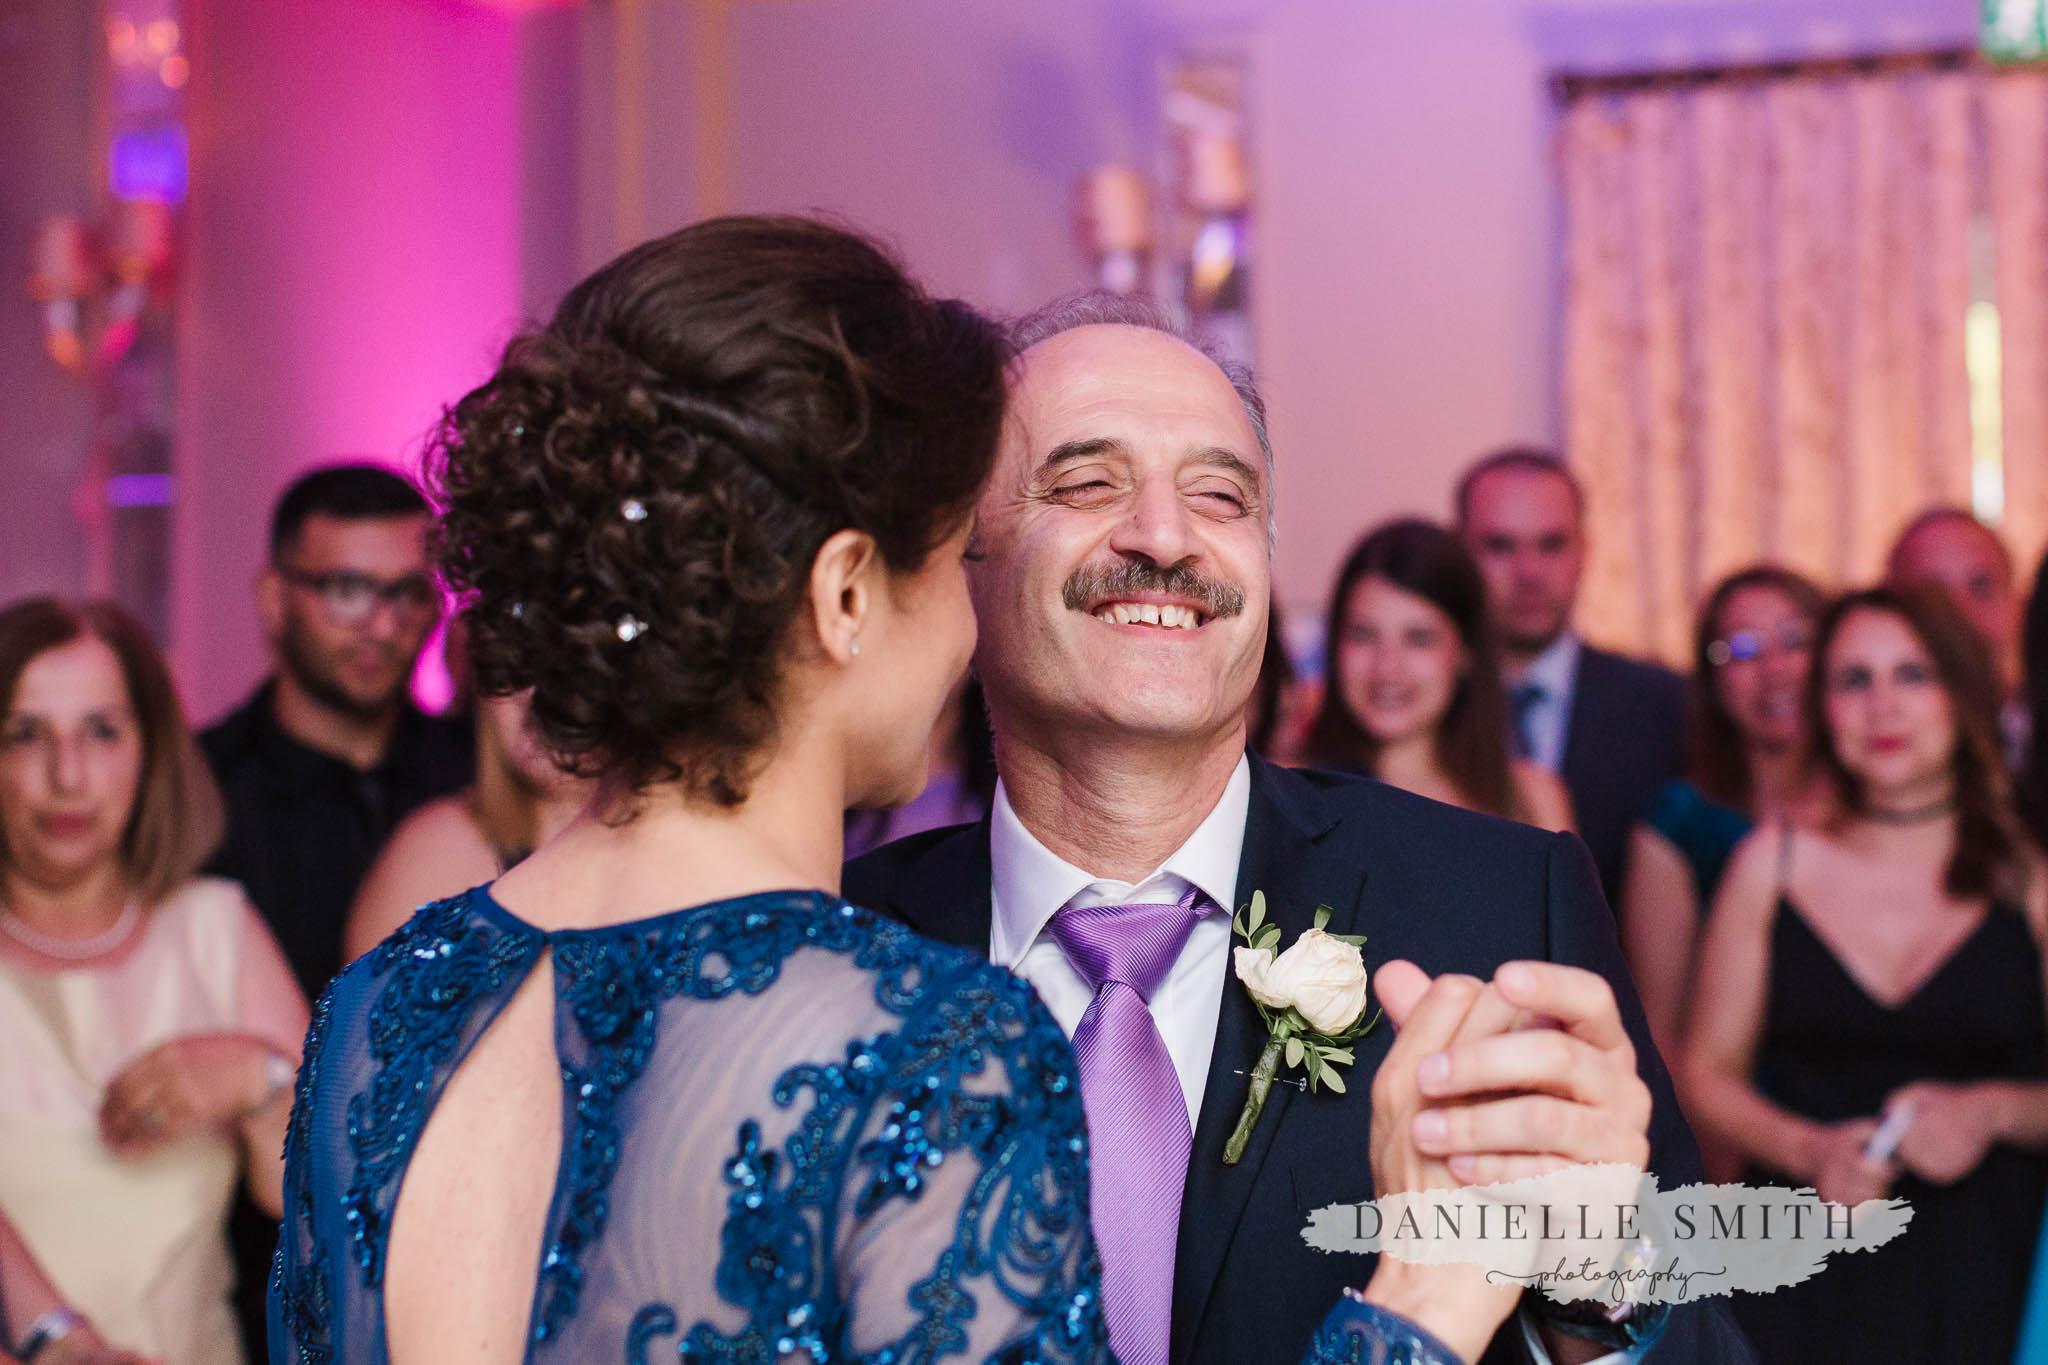 turkish parents dancing together